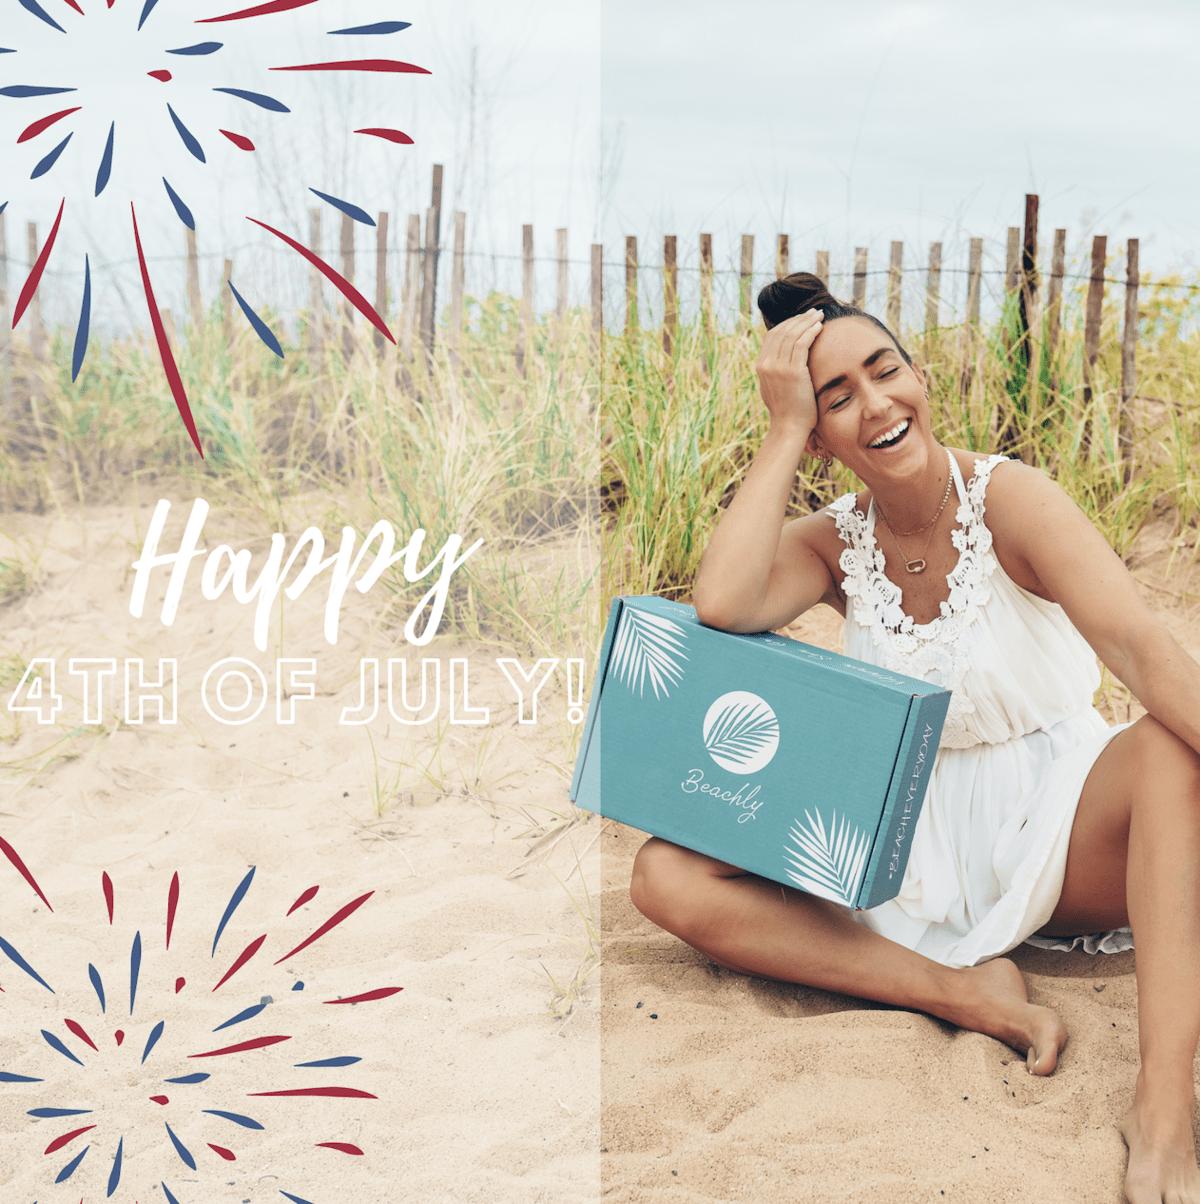 Beachly 4th of July Sale – Free Bonus Box